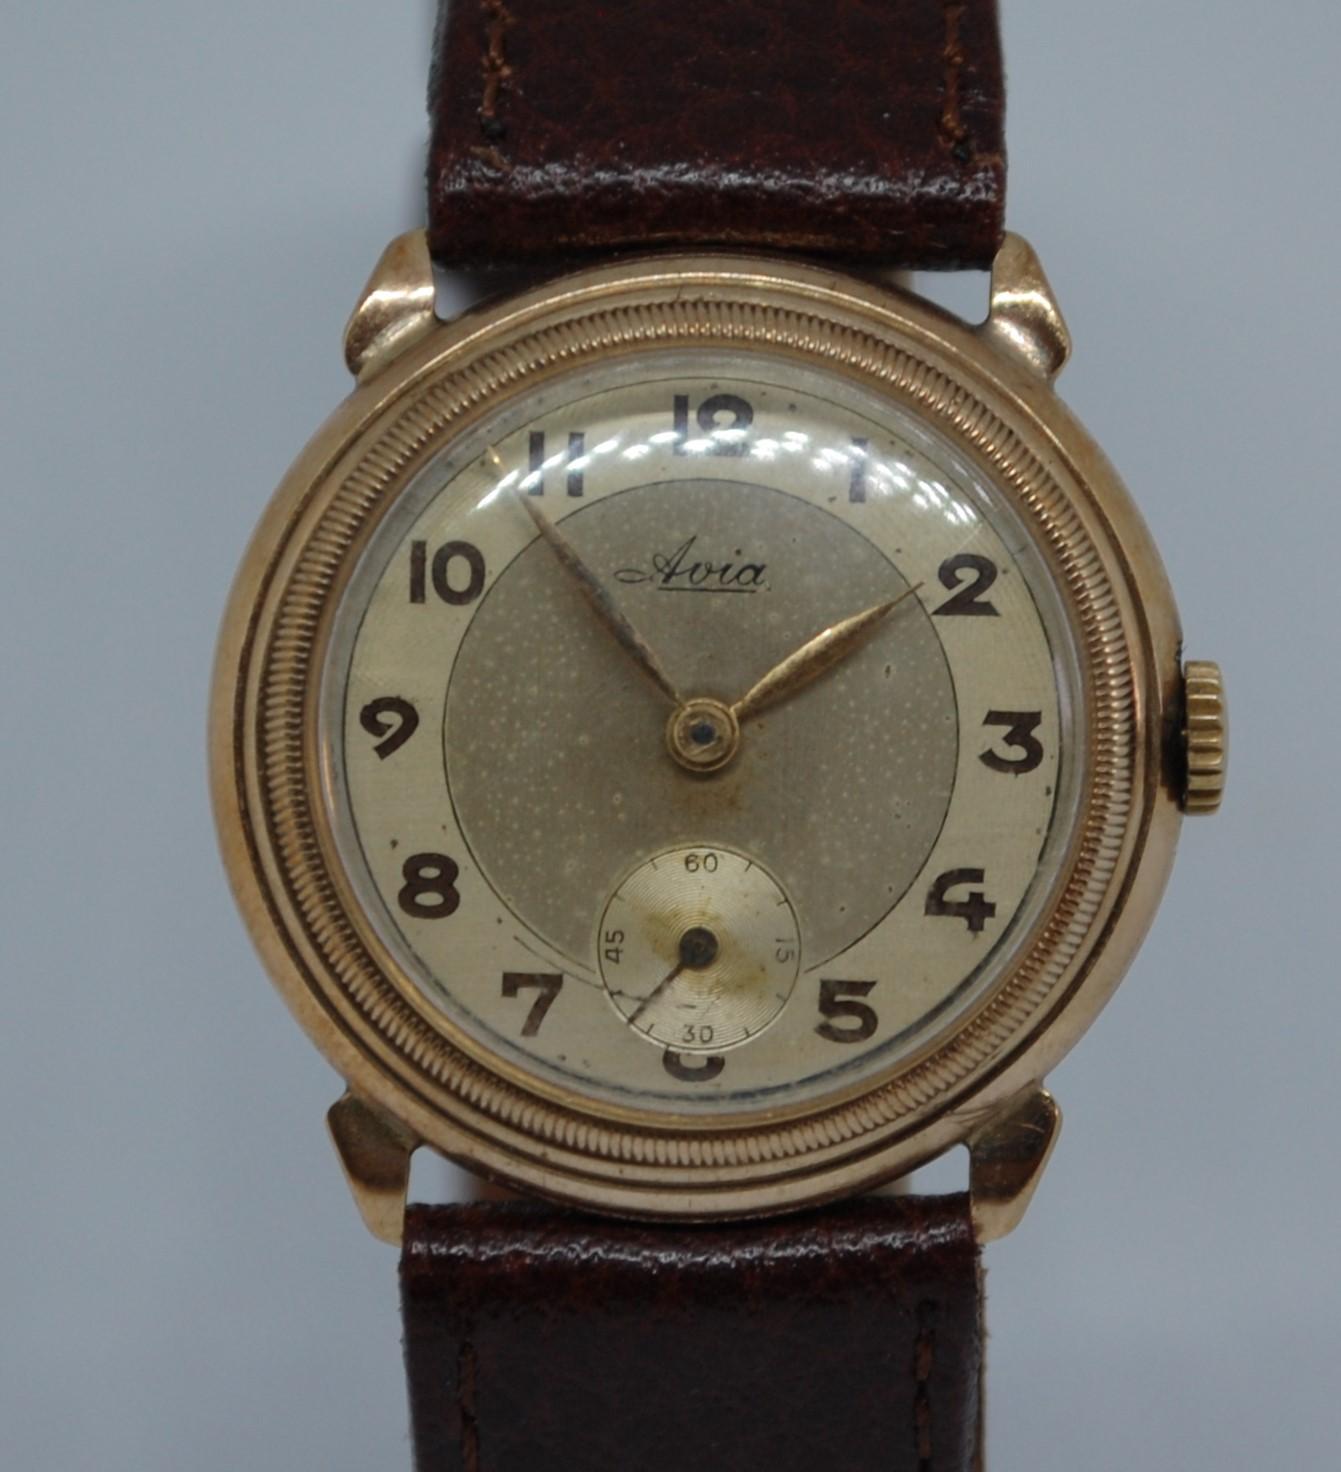 1944 1945 Avia men's 9k gold watch